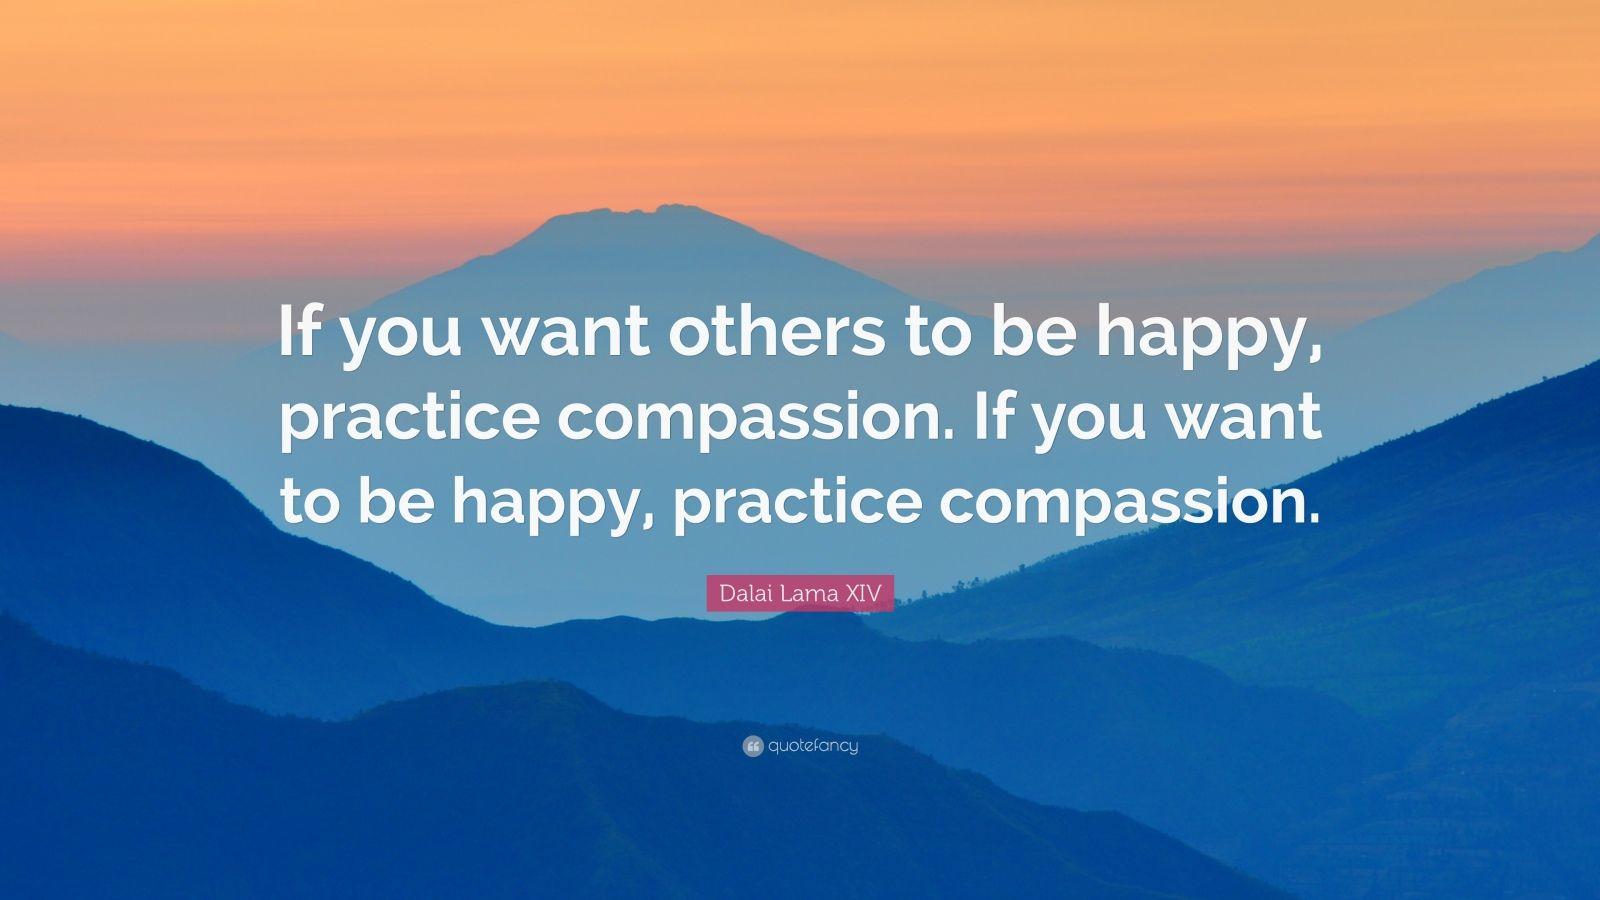 Dalai Lama Wallpaper Quotes Dalai Lama Xiv Quote If You Want Others To Be Happy